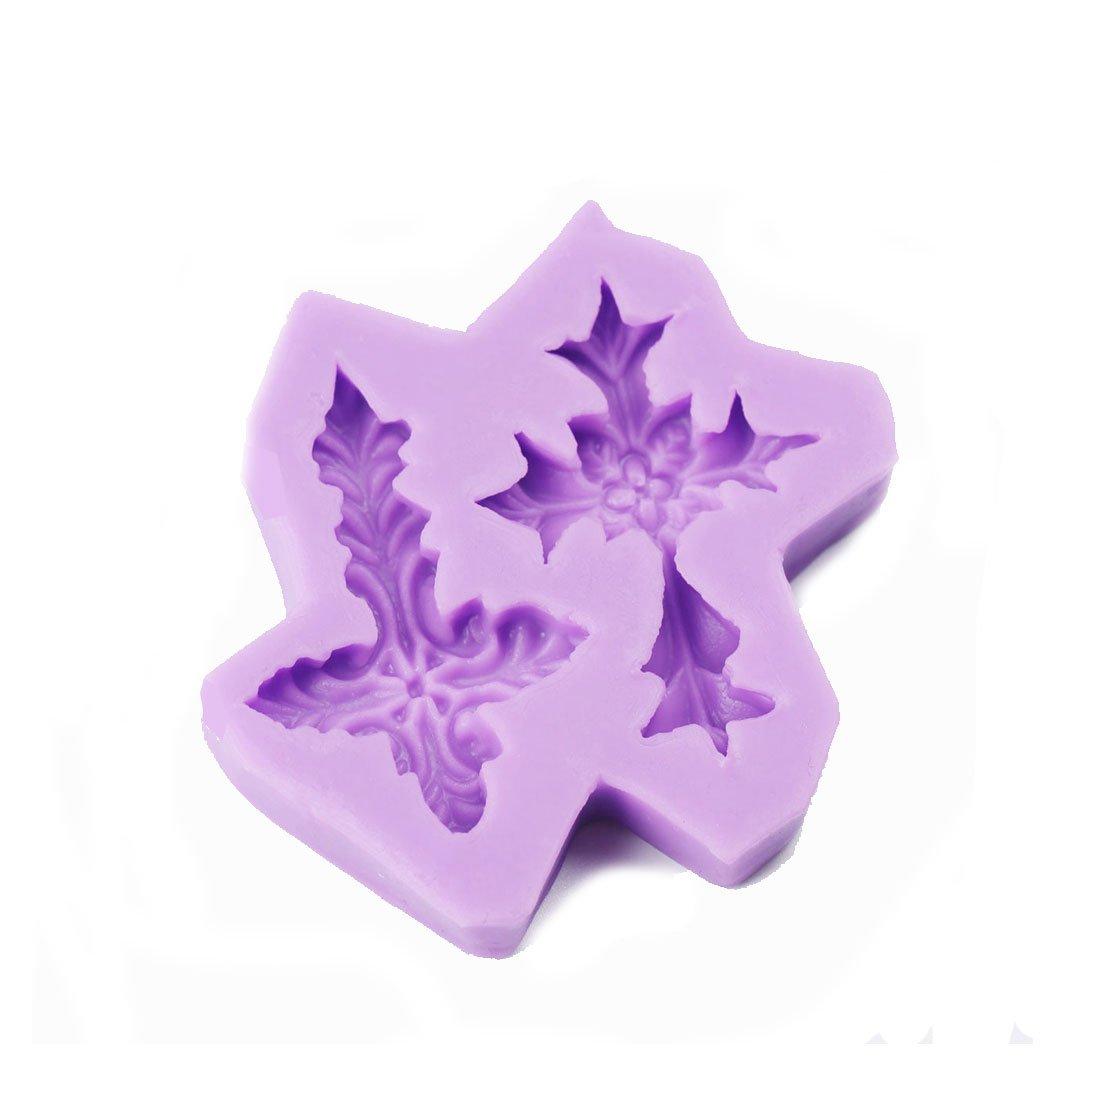 Silicone Mold Soap Fondant Cake Decoration Sugar Craft DIY Gumpaste Cake Decorating Clay (2 Cross Shape)